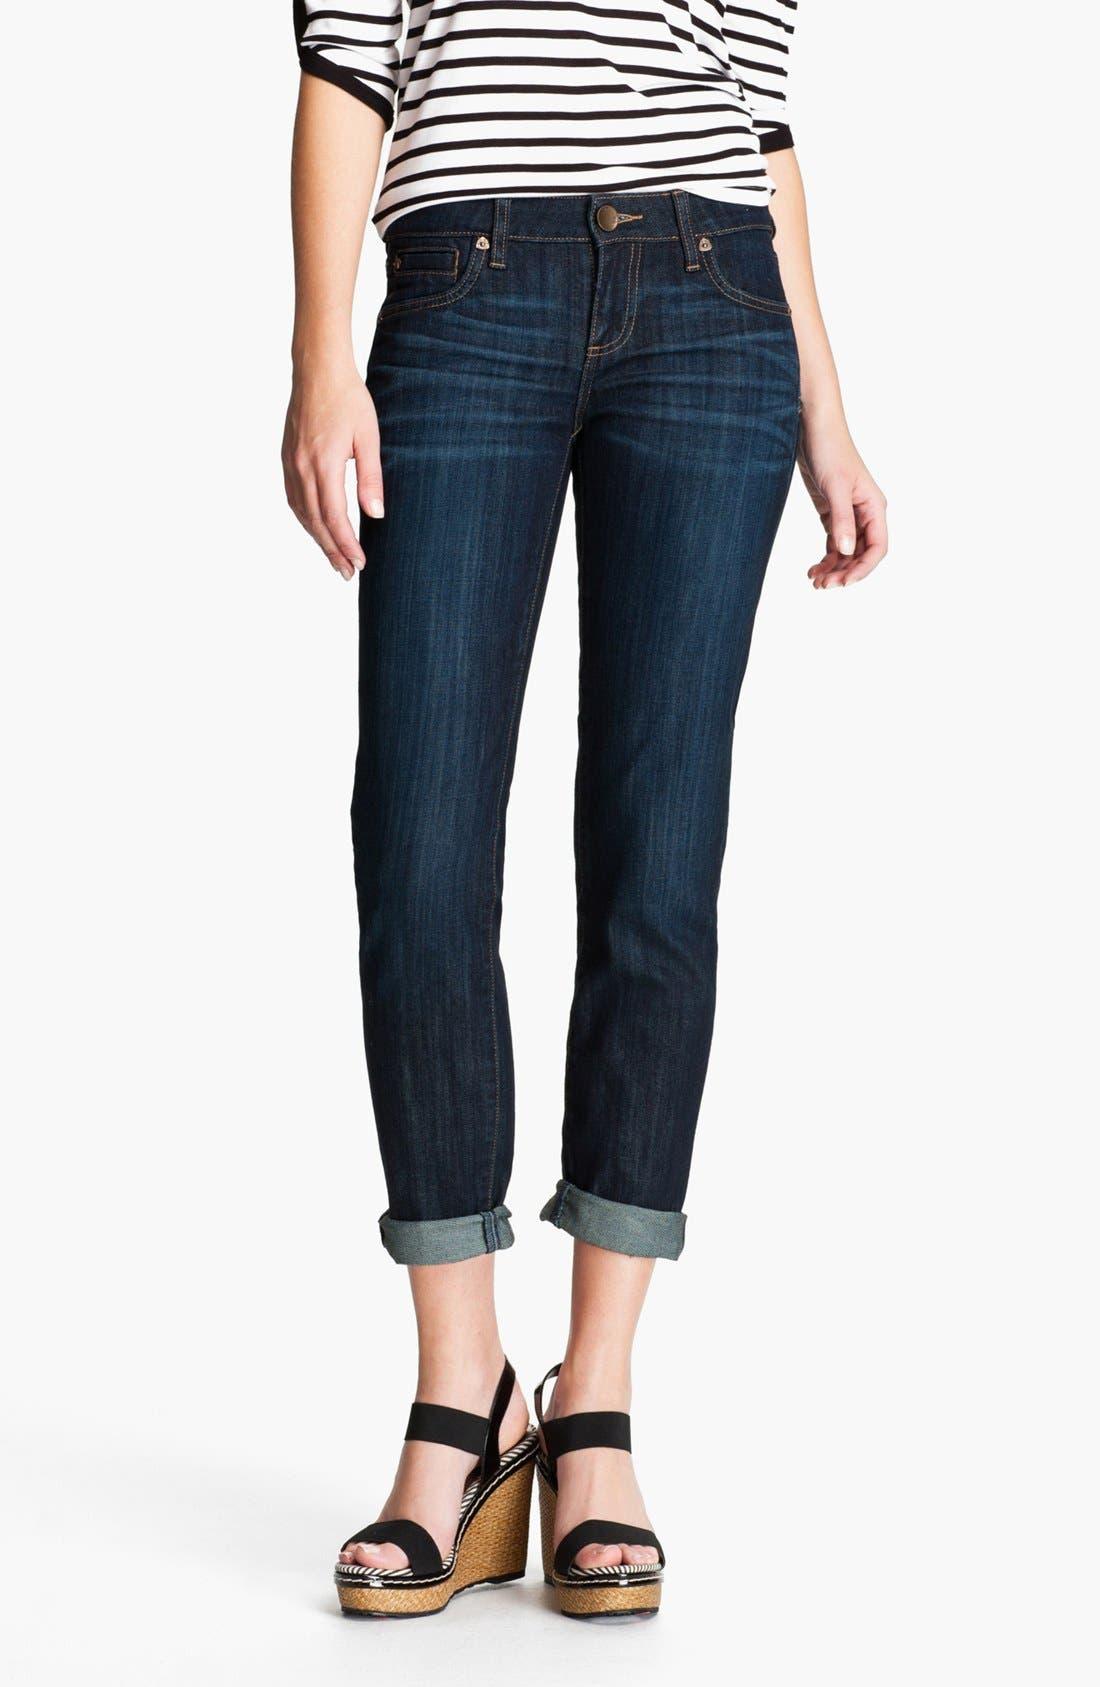 Main Image - KUT from the Kloth 'Catherine' Slim Boyfriend Jeans (Royal) (Regular & Petite)